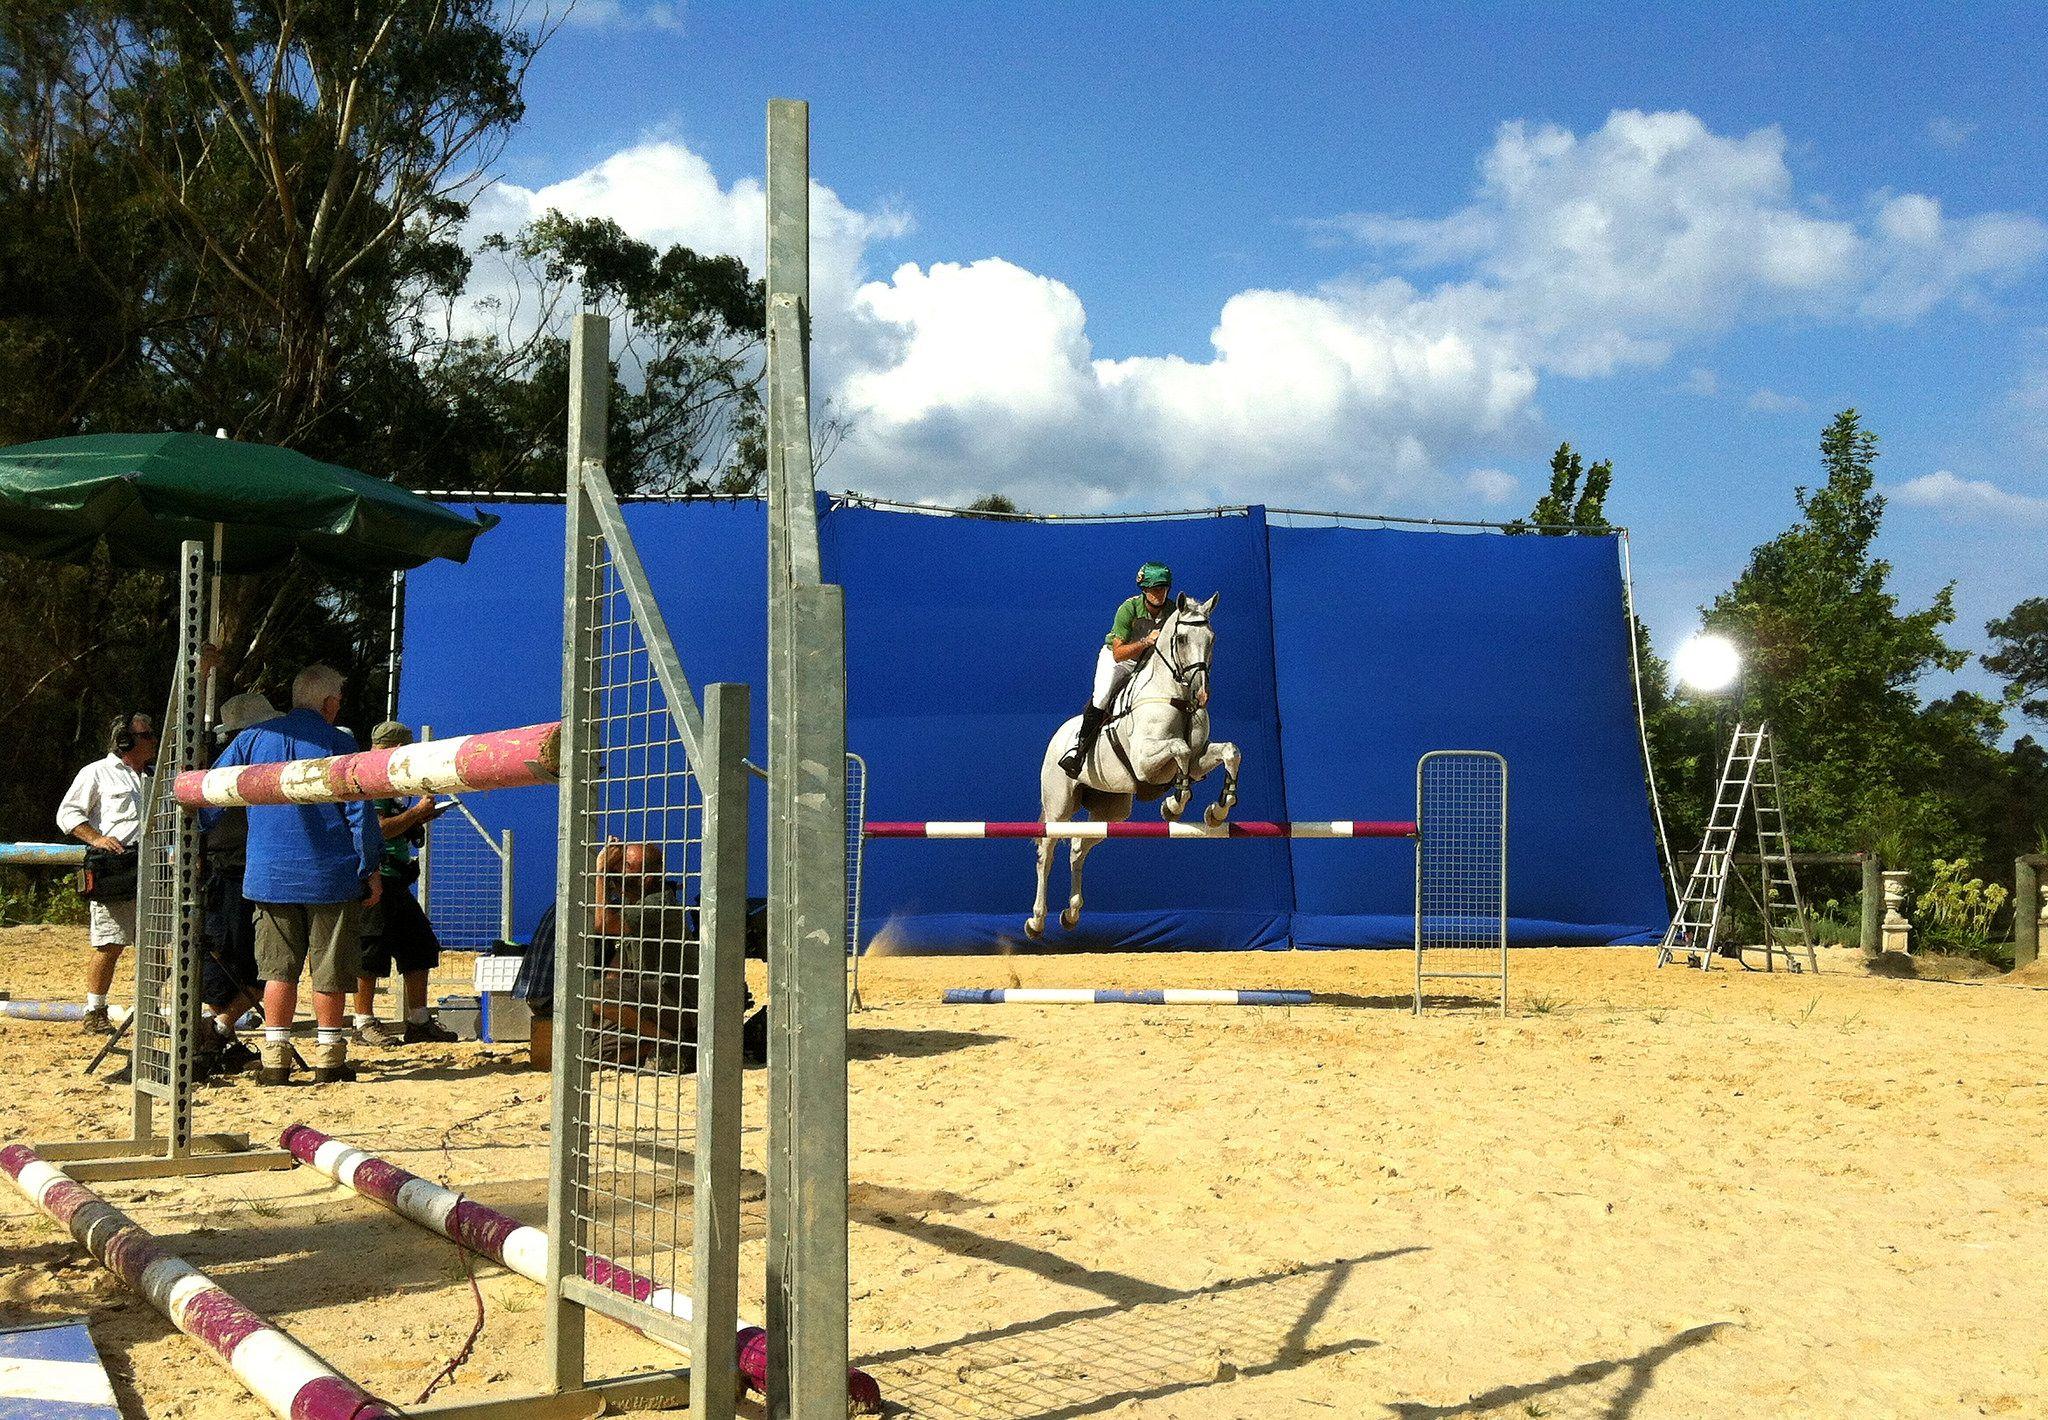 Olympics Commercial Bluescreen. Equestrian by Joseph Pole VFX Supervisor | #Olympics #Bluescreen #Equestrian #JosephPole #VFXSupervisor